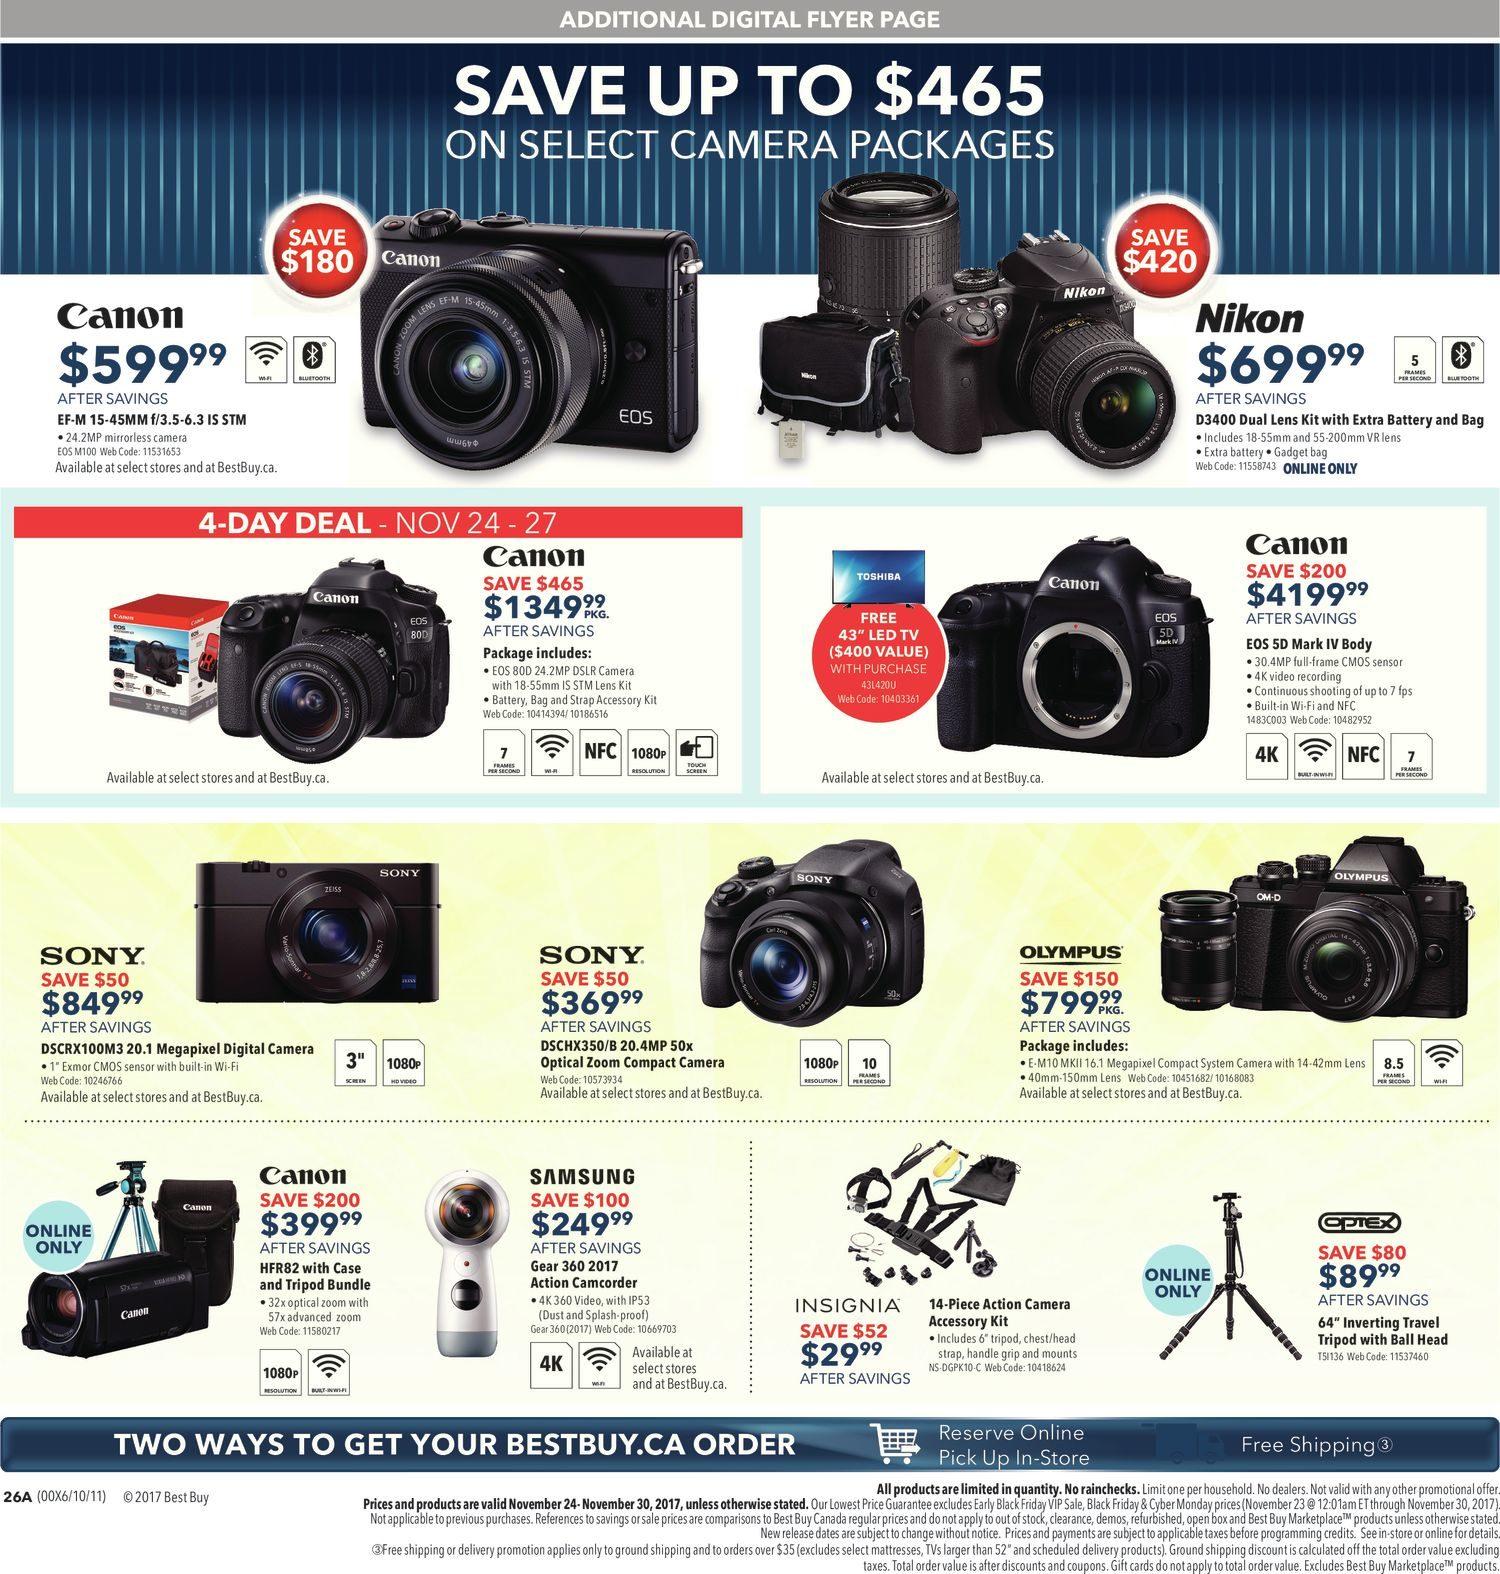 Best Buy Weekly Flyer - Weekly - Black Friday Sale - Nov 24 – 30 -  RedFlagDeals.com c126149e38ffc